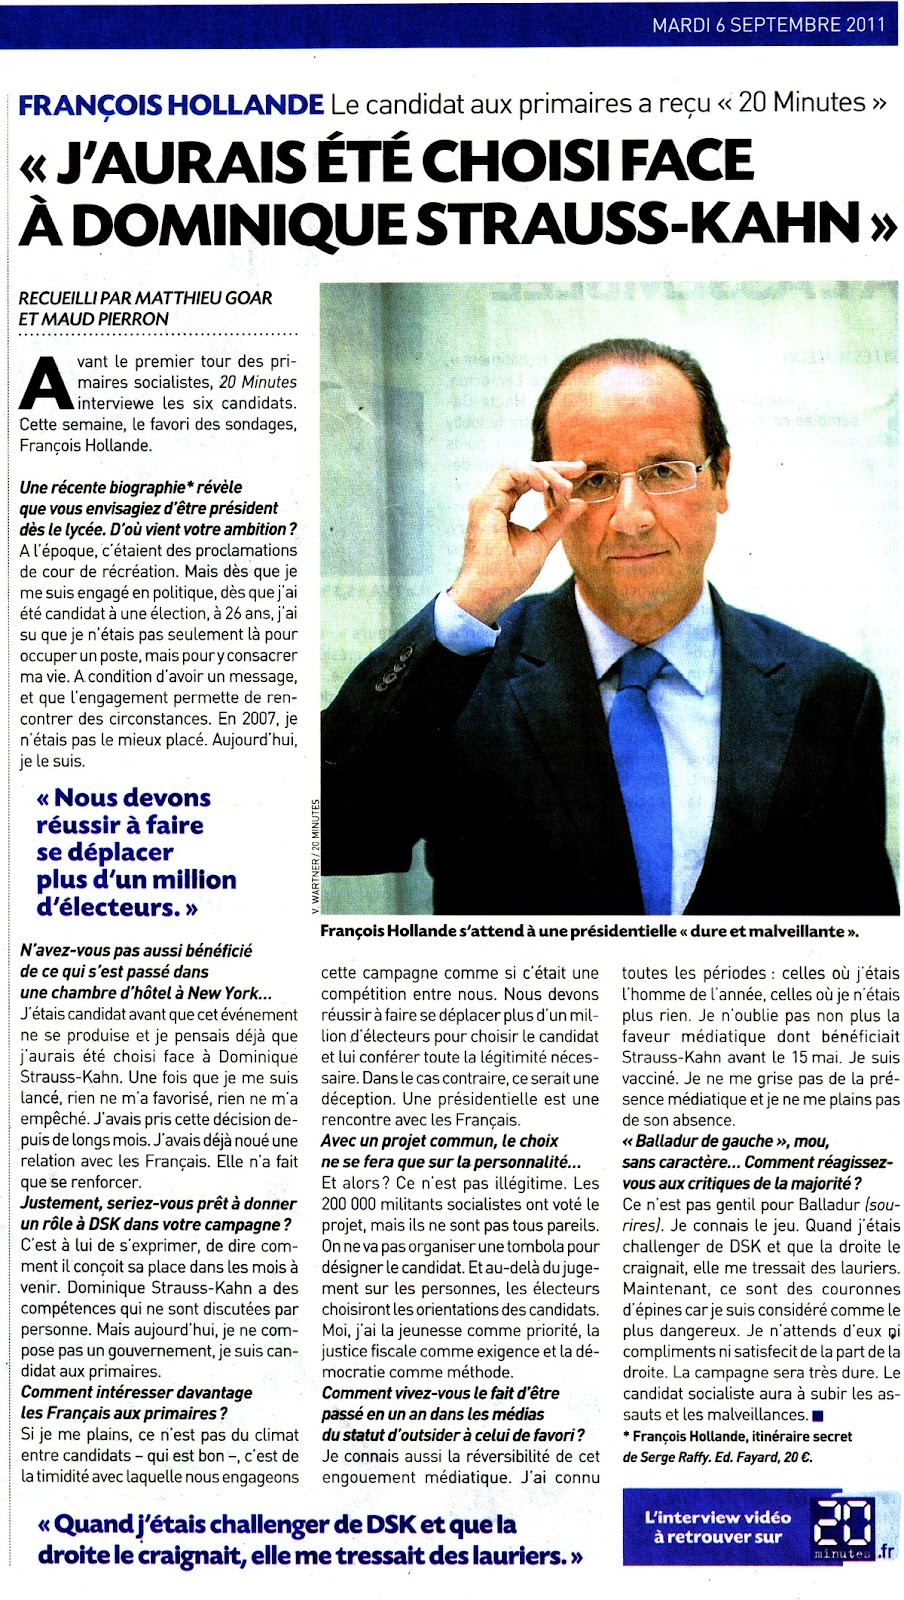 hollande_presidentielle_election__bayrou_poutou_arthaud_republique_france_sarkozy_banon_strauss_kahn